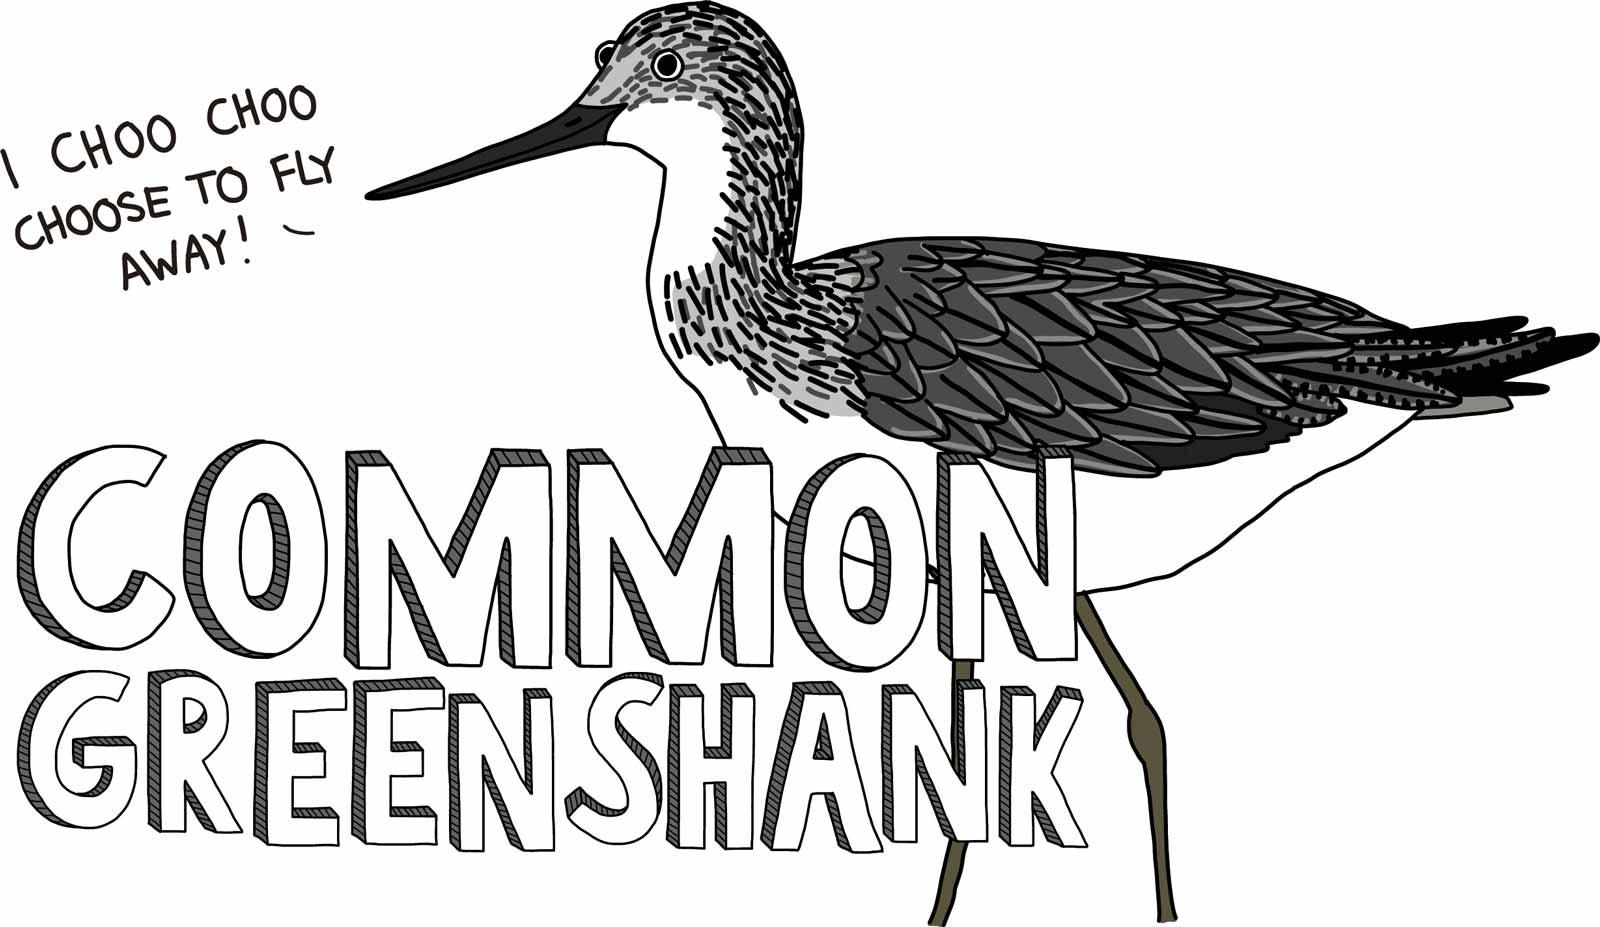 Cartoon of a common greenshank